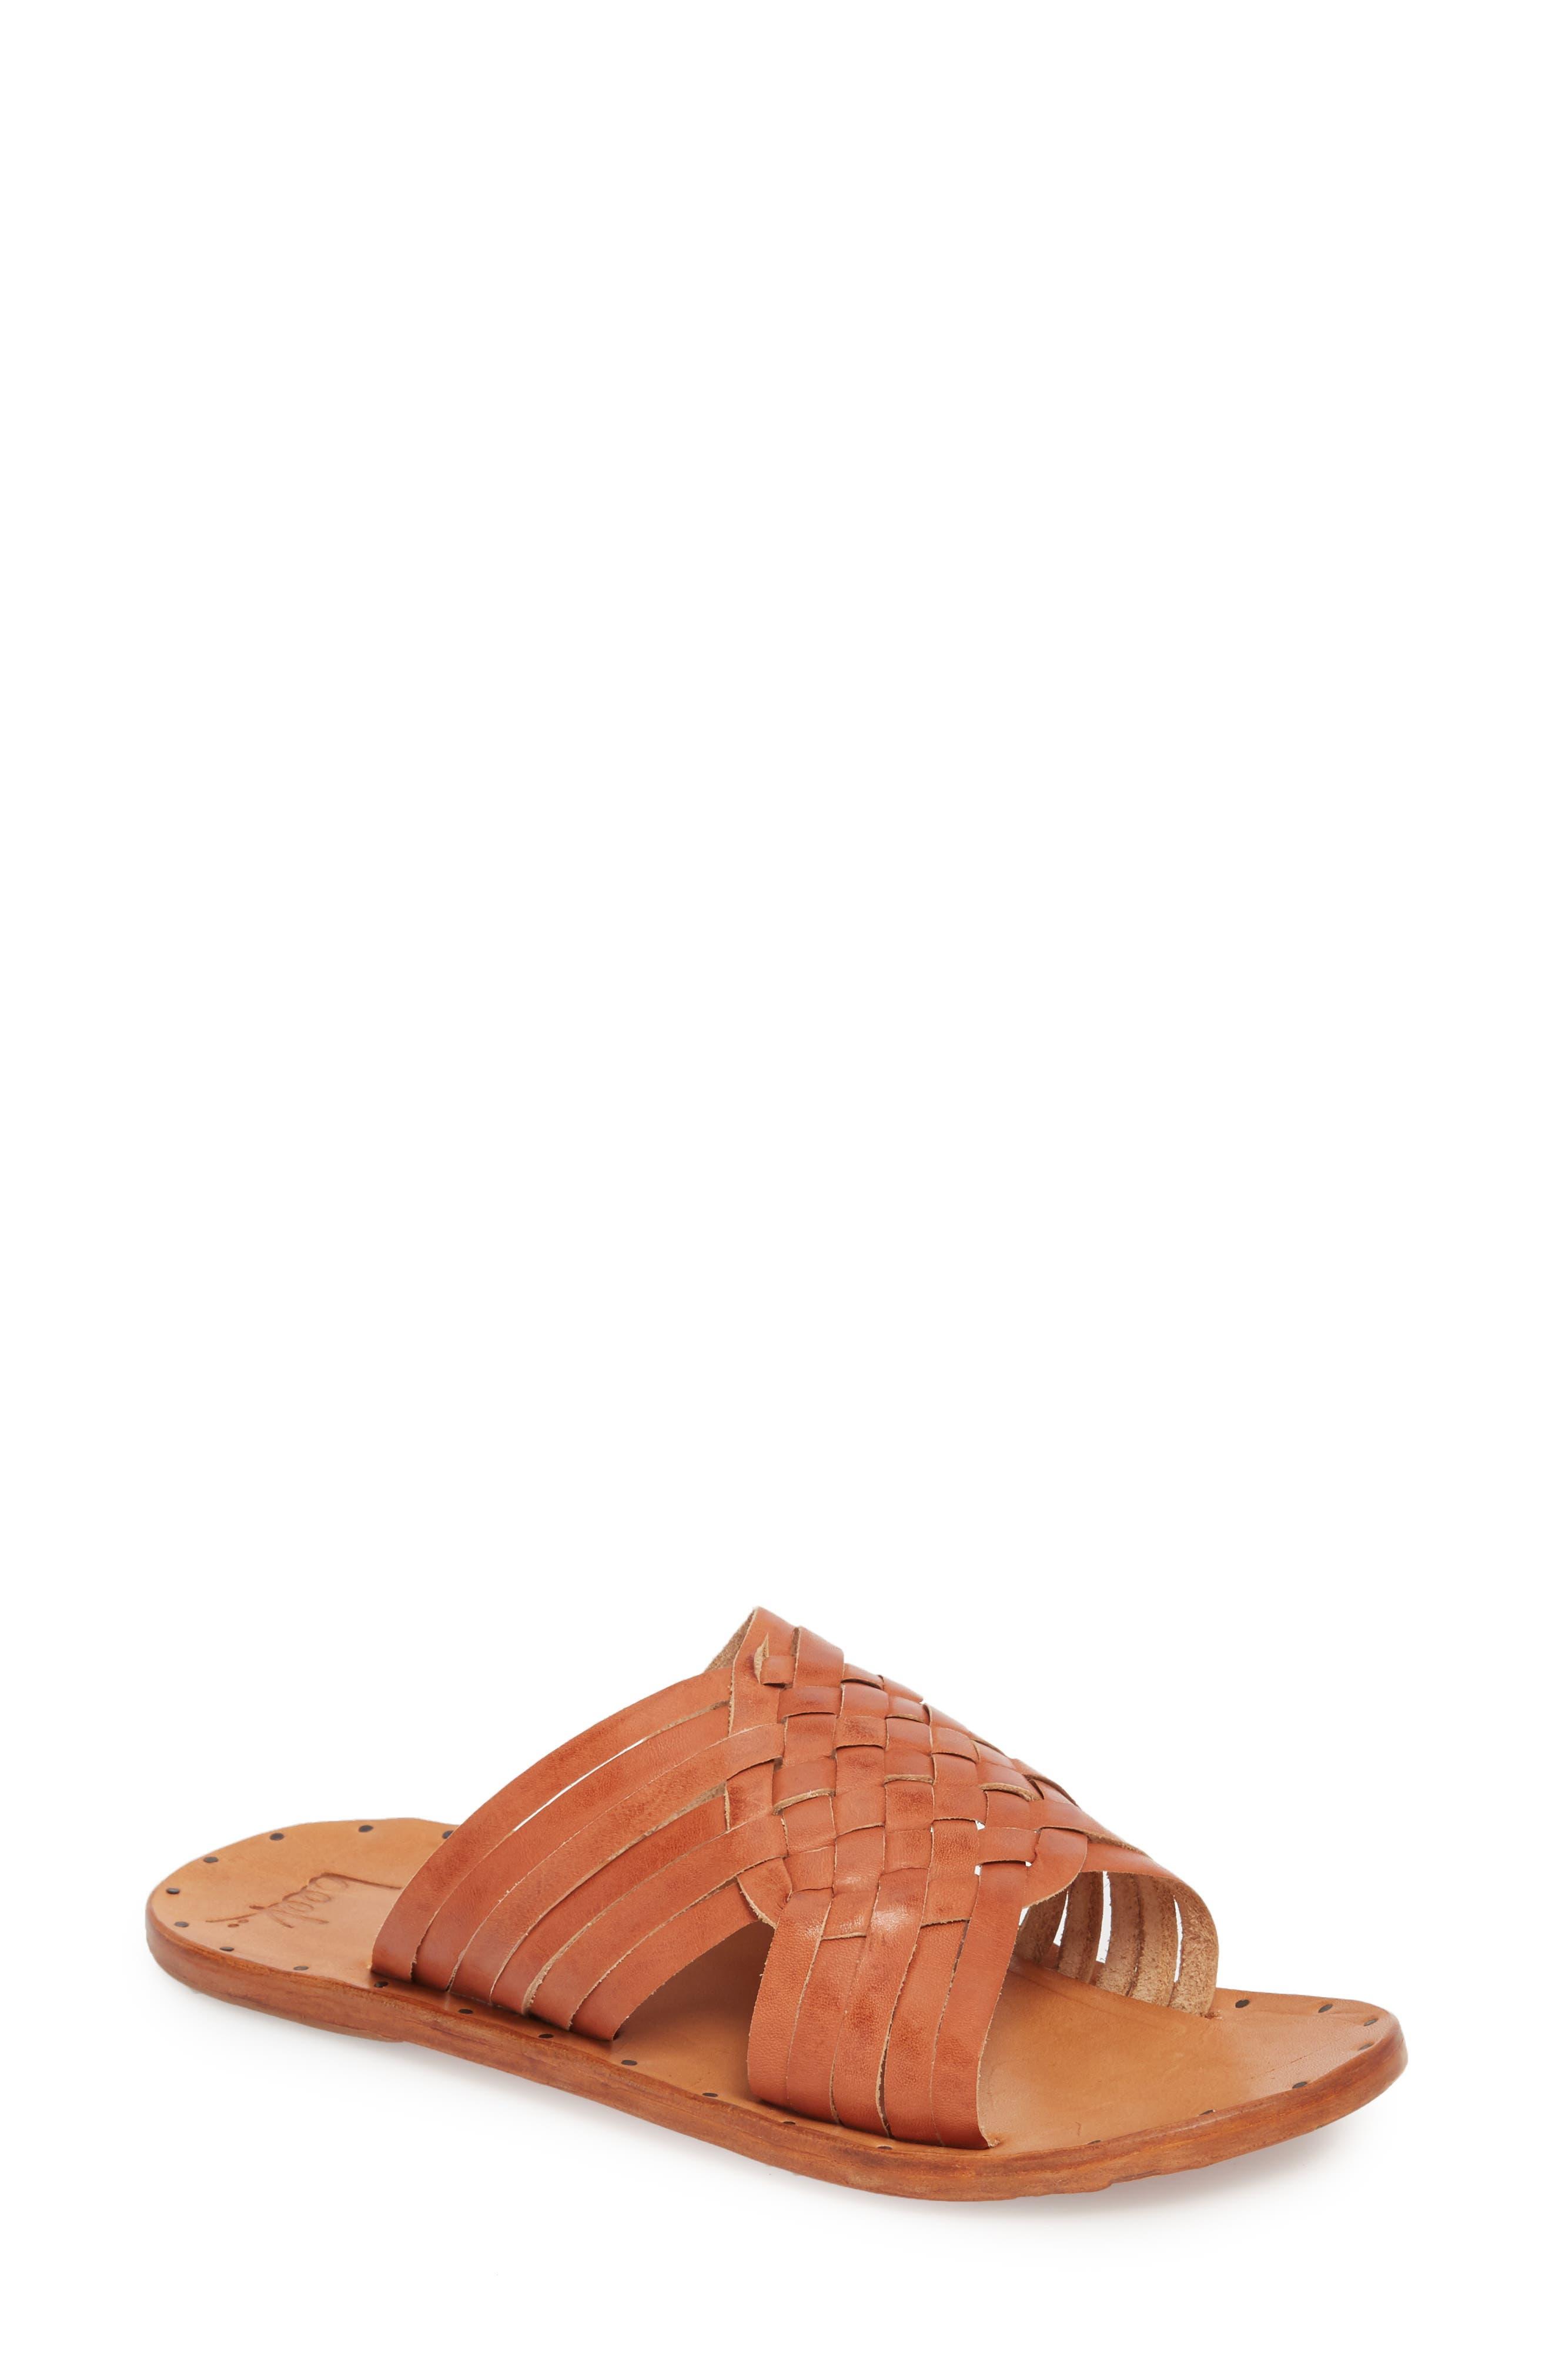 Alternate Image 1 Selected - Beek Swallow Sandal (Women)